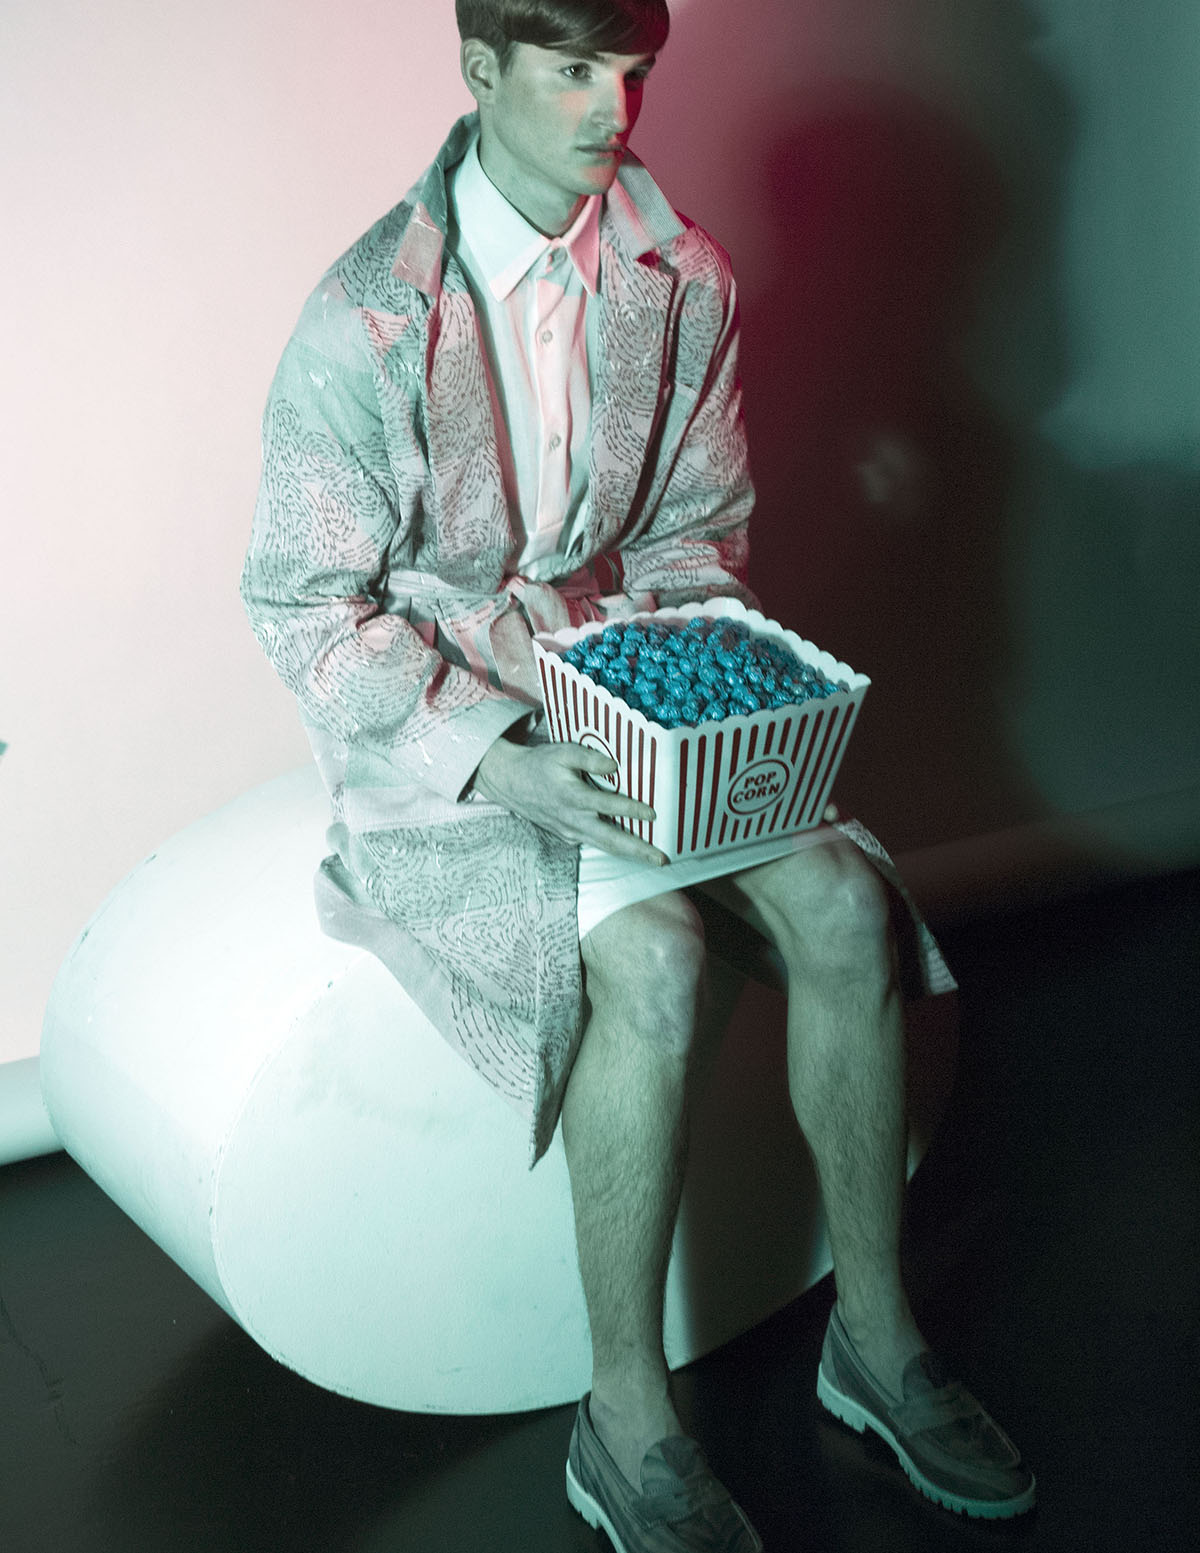 Pink Dreams - Peter Frampton by Karolina Hubner for CHASSEUR Magazine